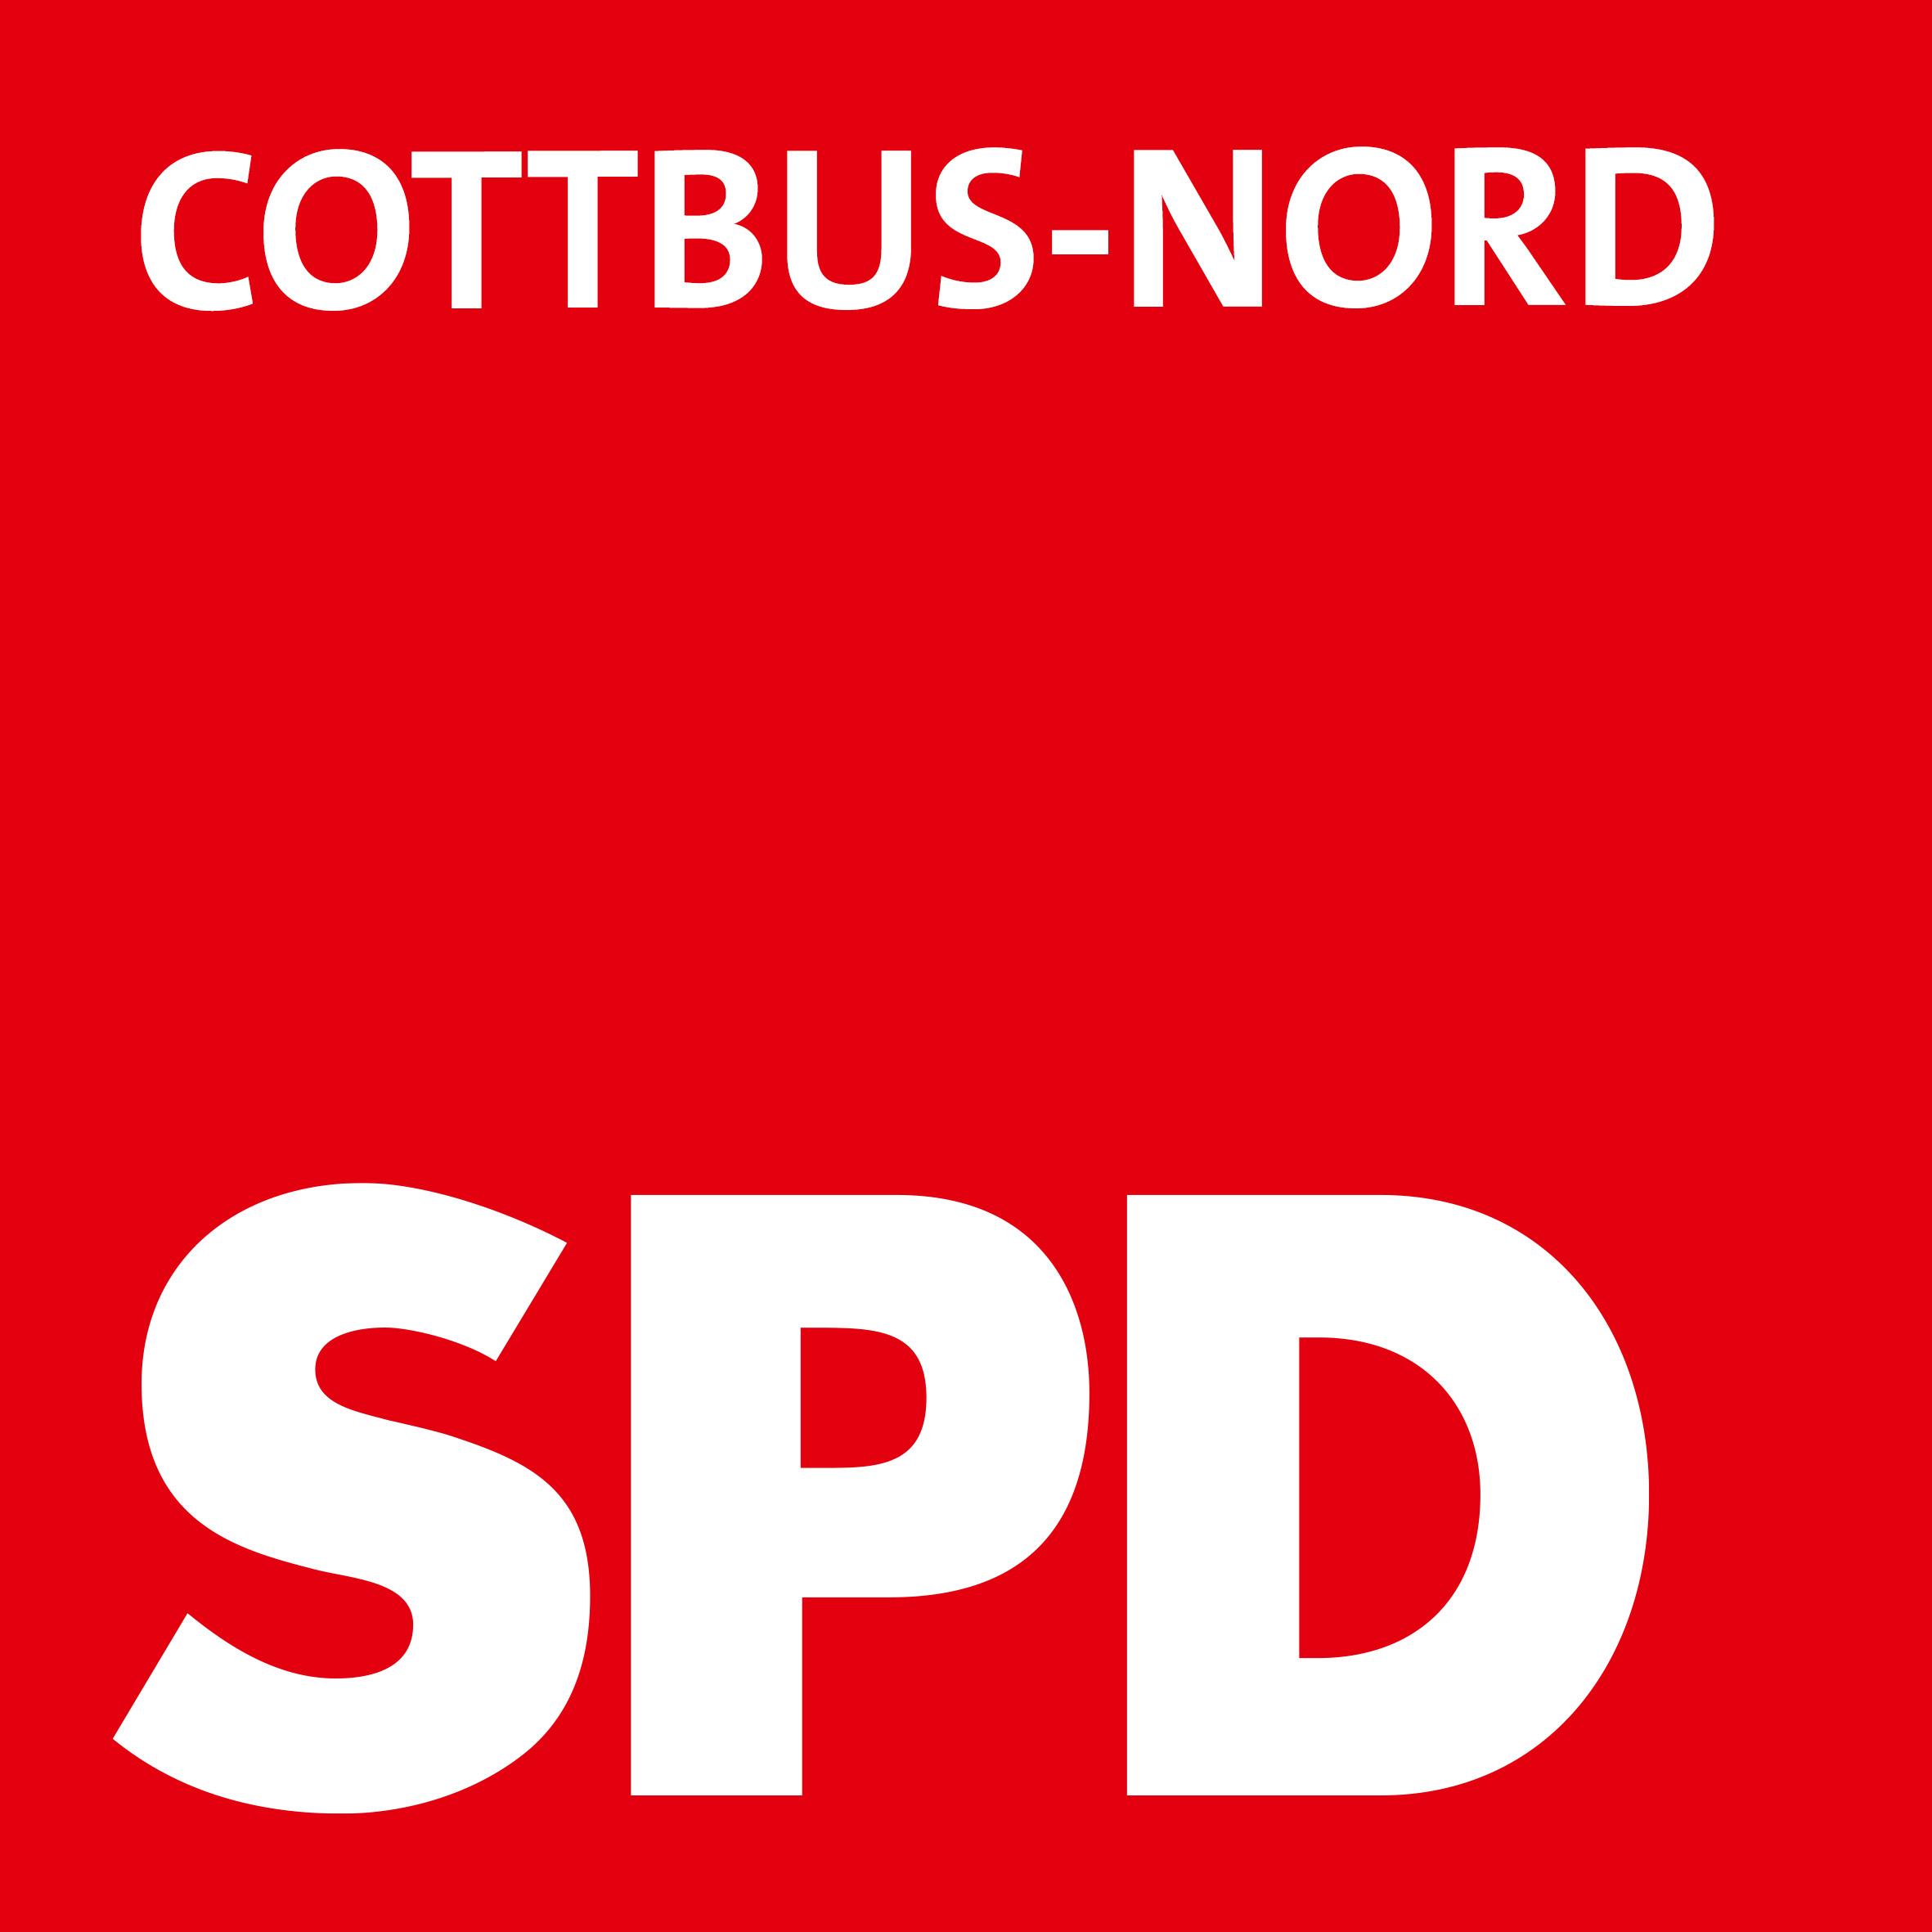 SPD Cottbus-Nord